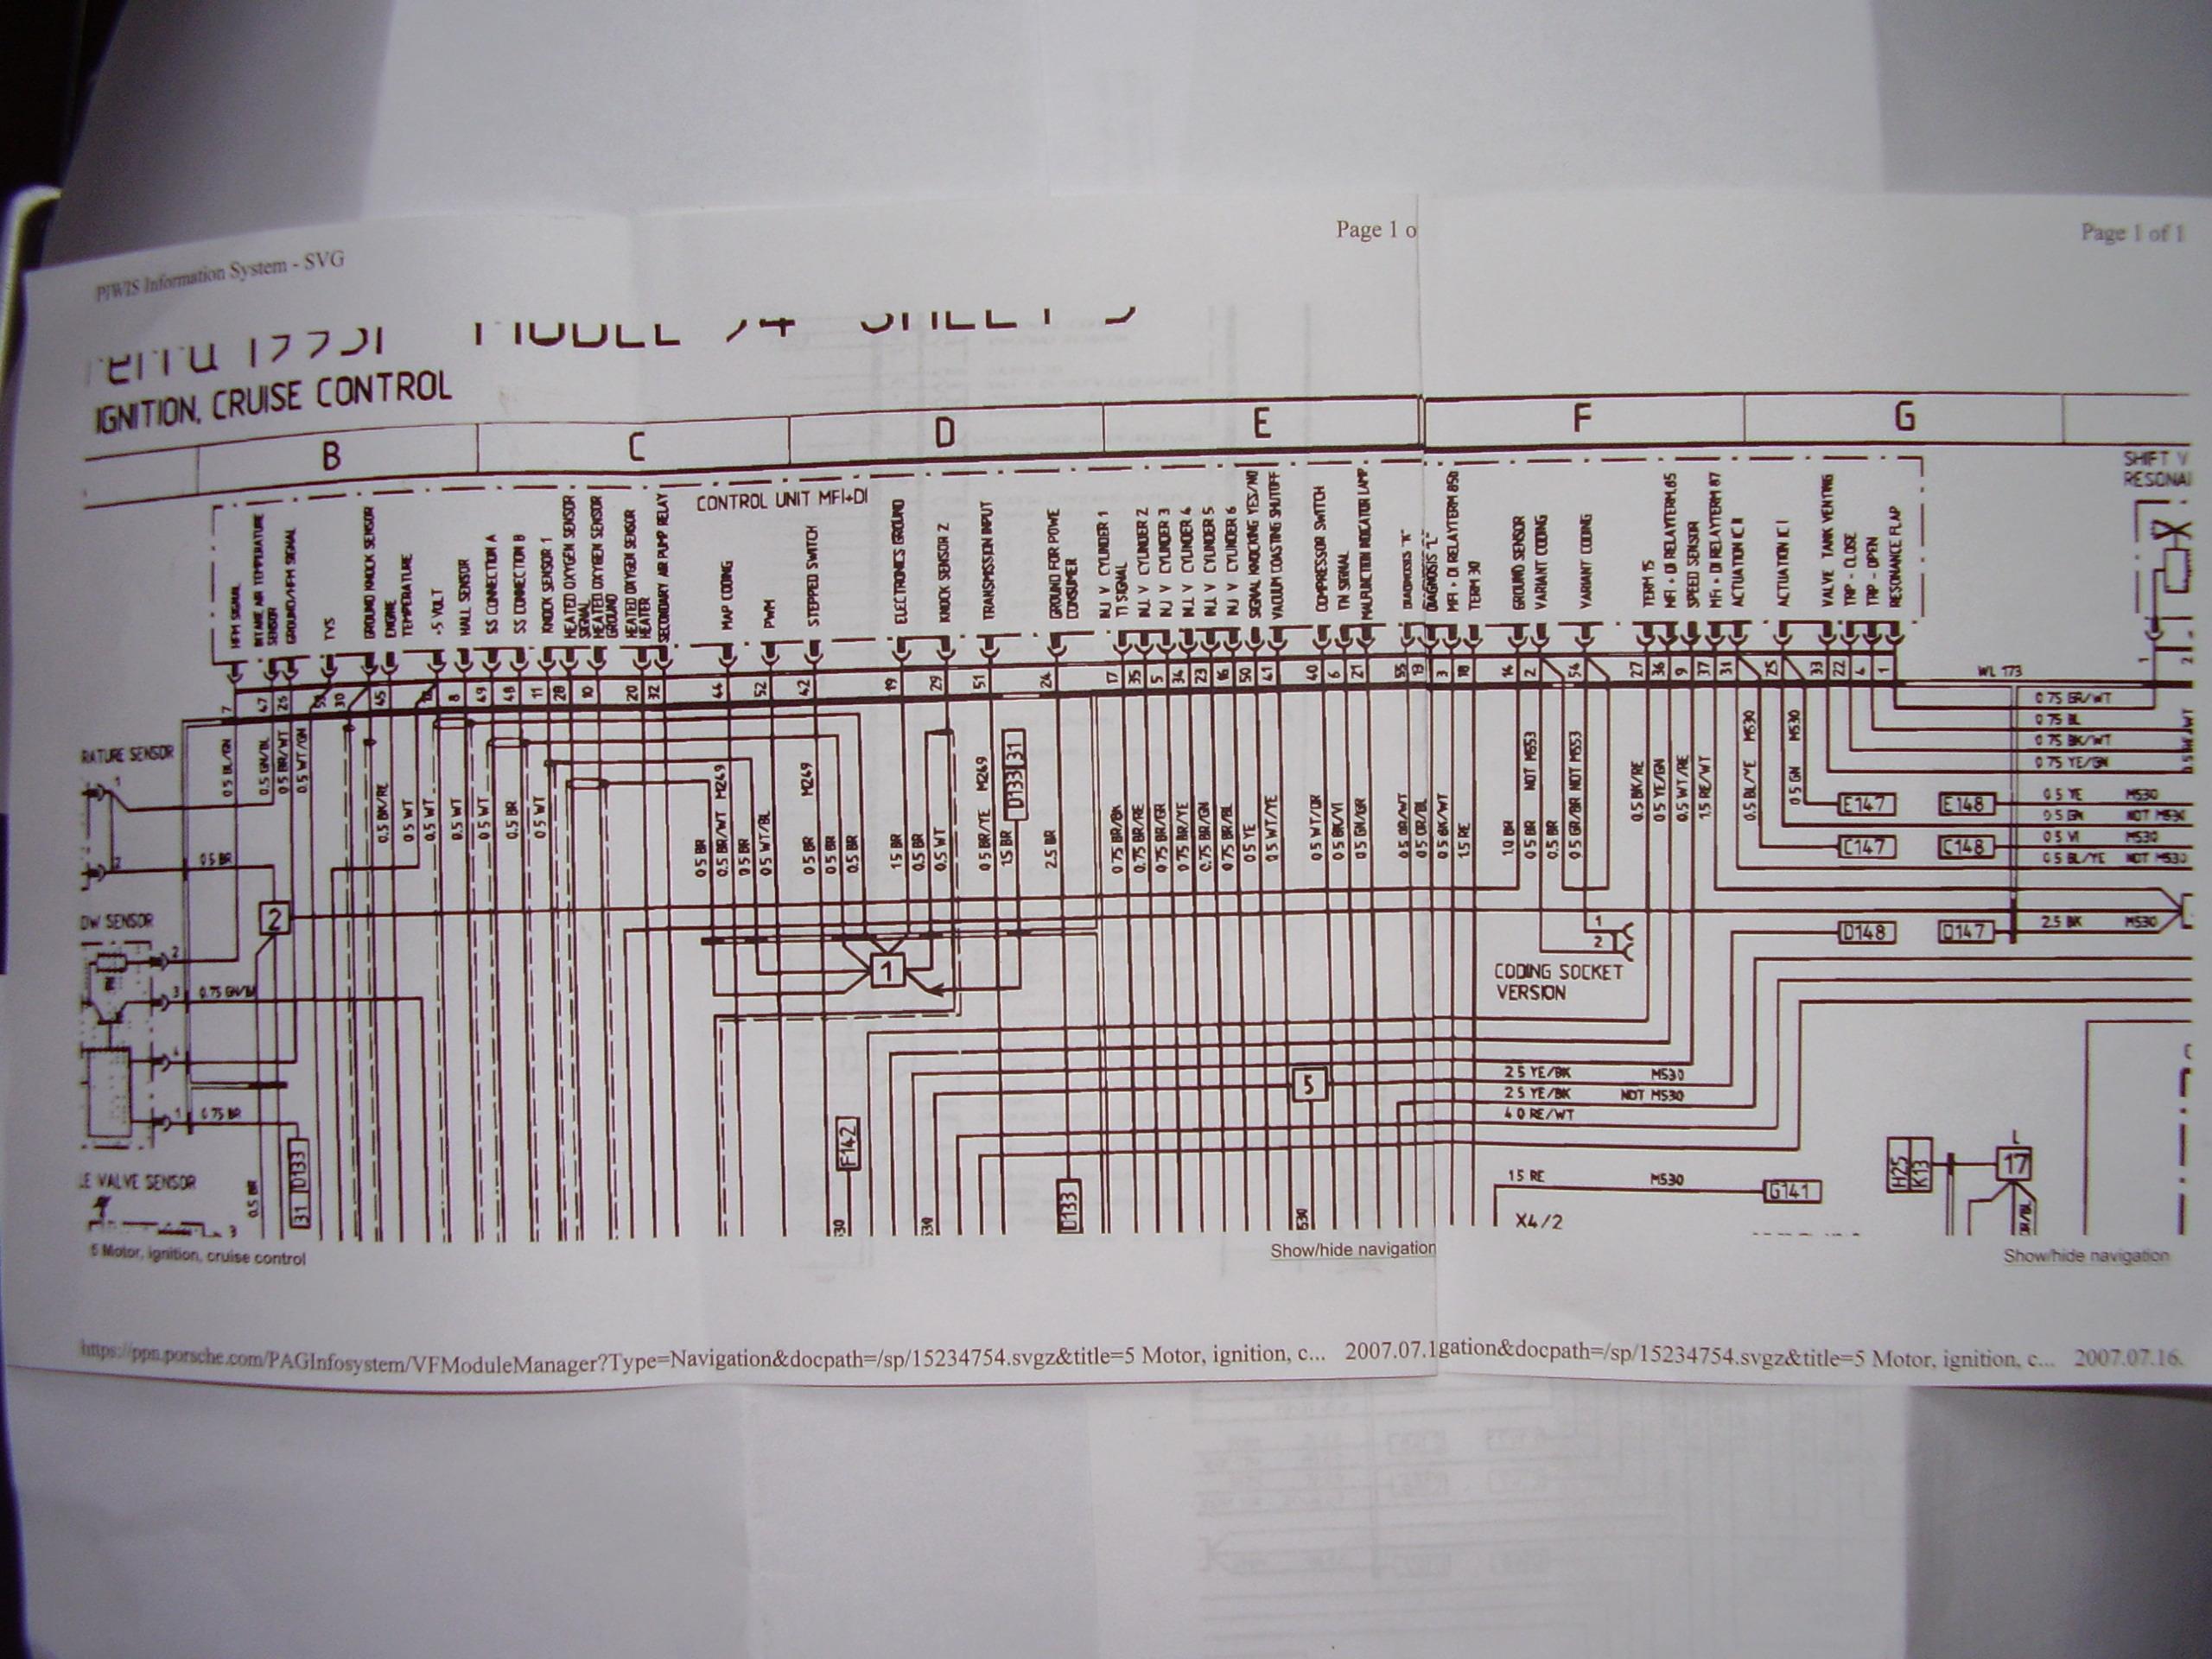 Niedlich 1982 Porsche 928 Schaltplan Galerie - Verdrahtungsideen ...